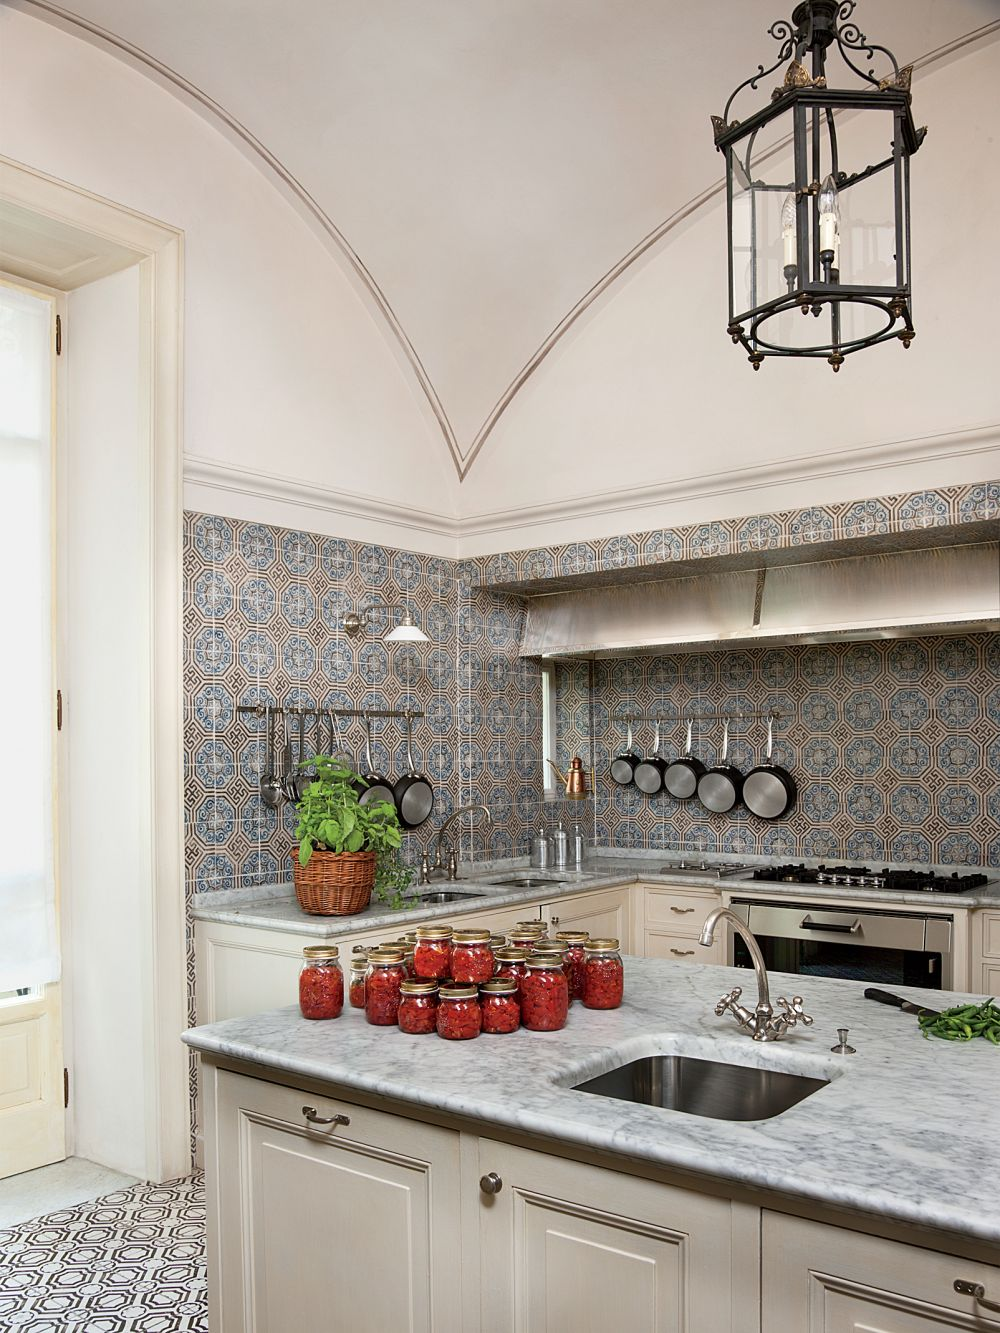 traditional-kitchen-studio-peregalli-naples-italy-201112-2_1000.jpg